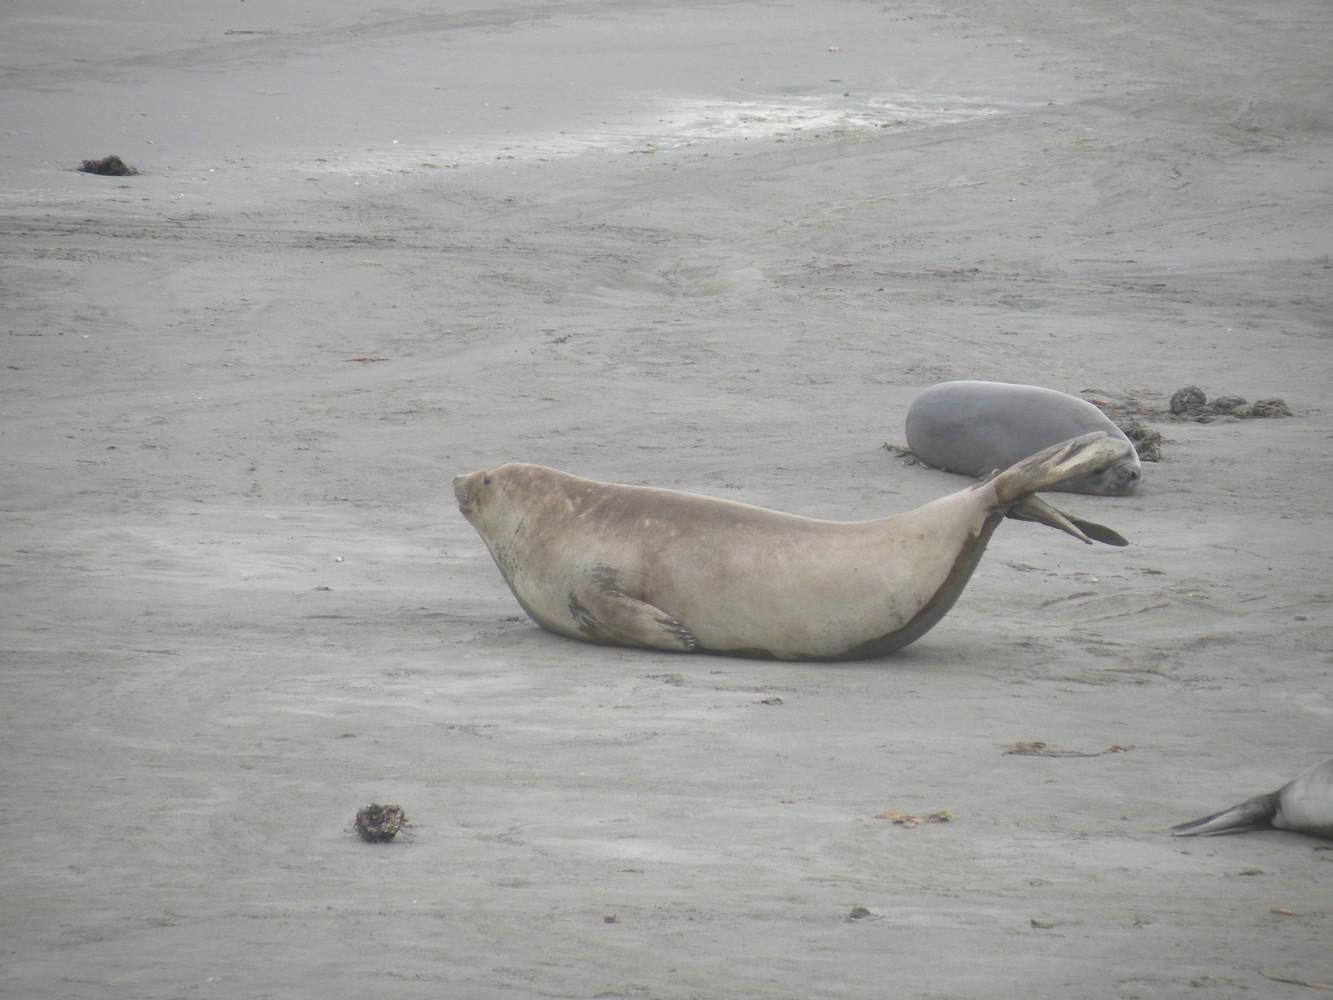 Eléphants de mer - Péninsule Valdés